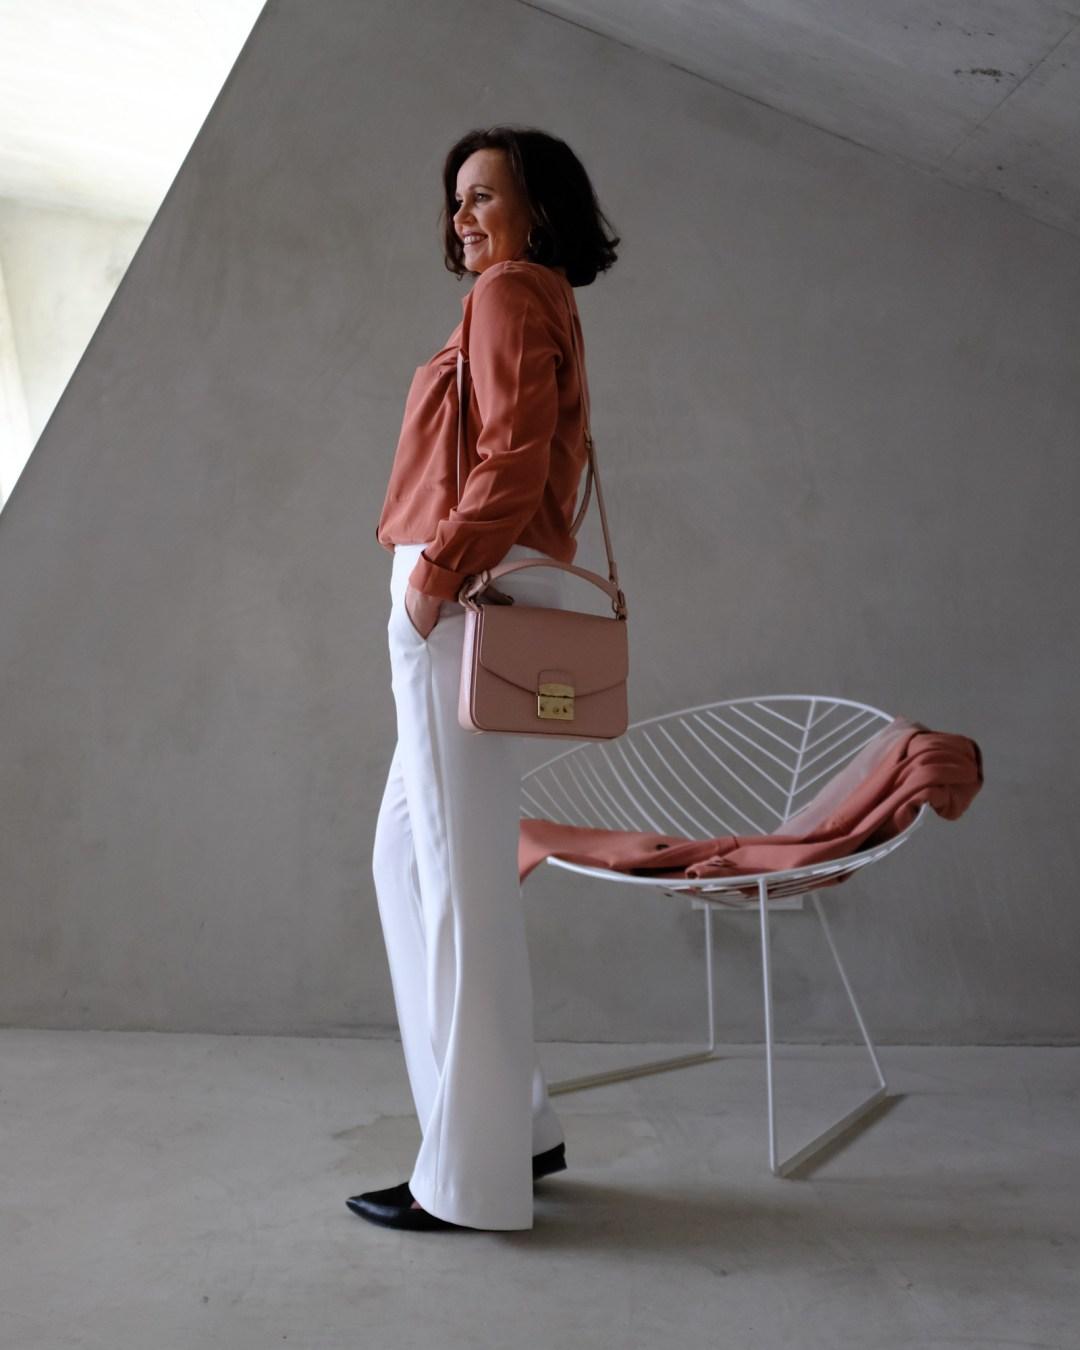 inastil, Trenchcoat, Springcoat, Frühjahrsmode, Stilberatung, Ü50Mode, Modeberatung, Frühlingsfarben, Modeblogger-17